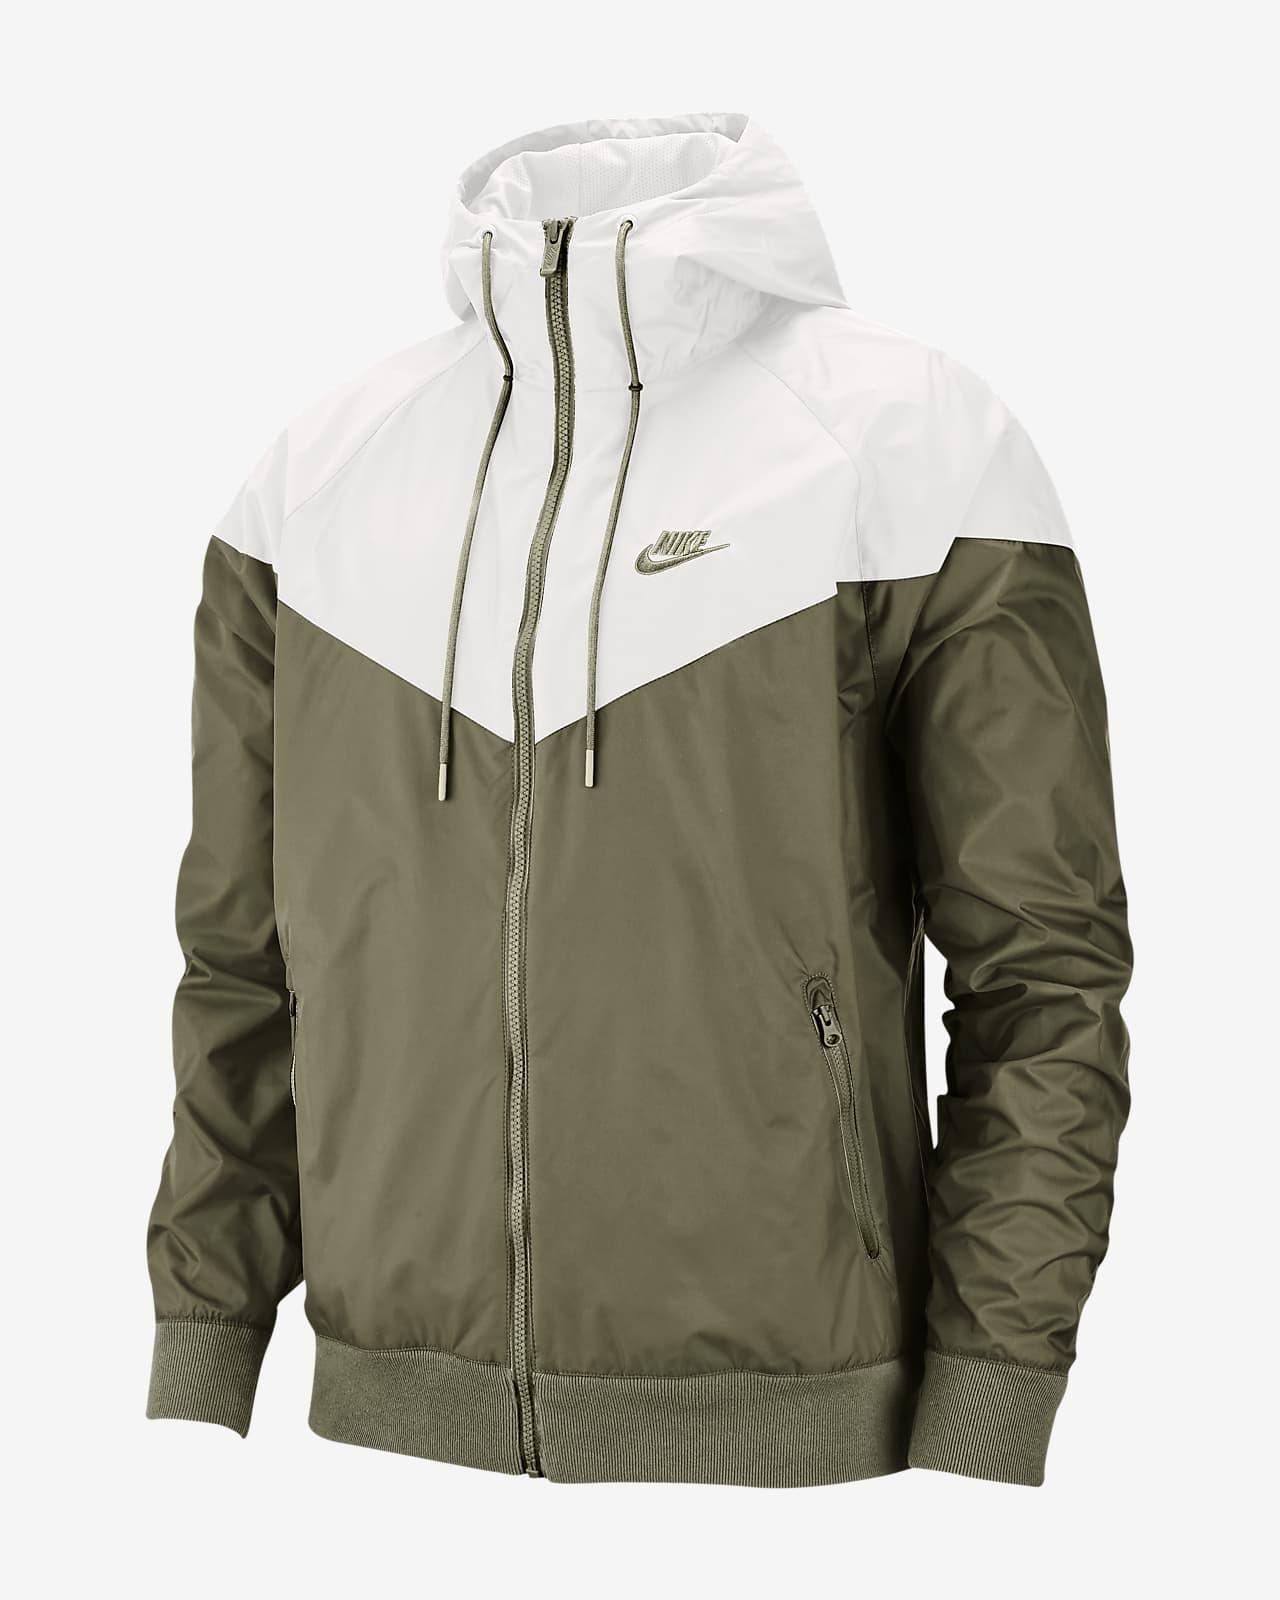 Windbreaker Nike Sportswear Windrunner med huva